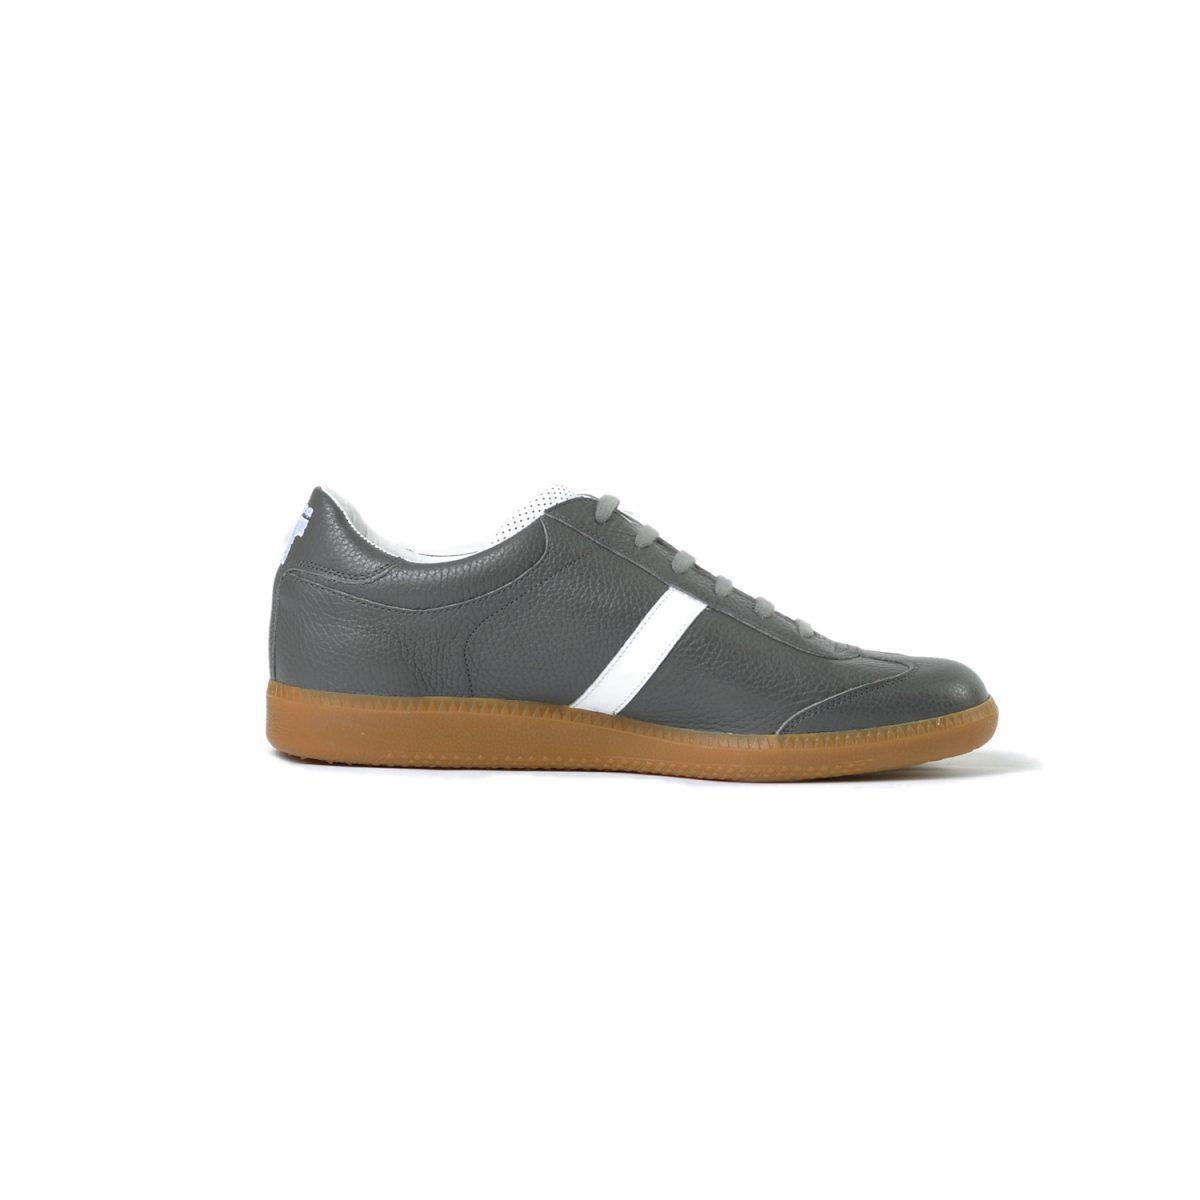 Tisza shoes - Compakt - Grey-white